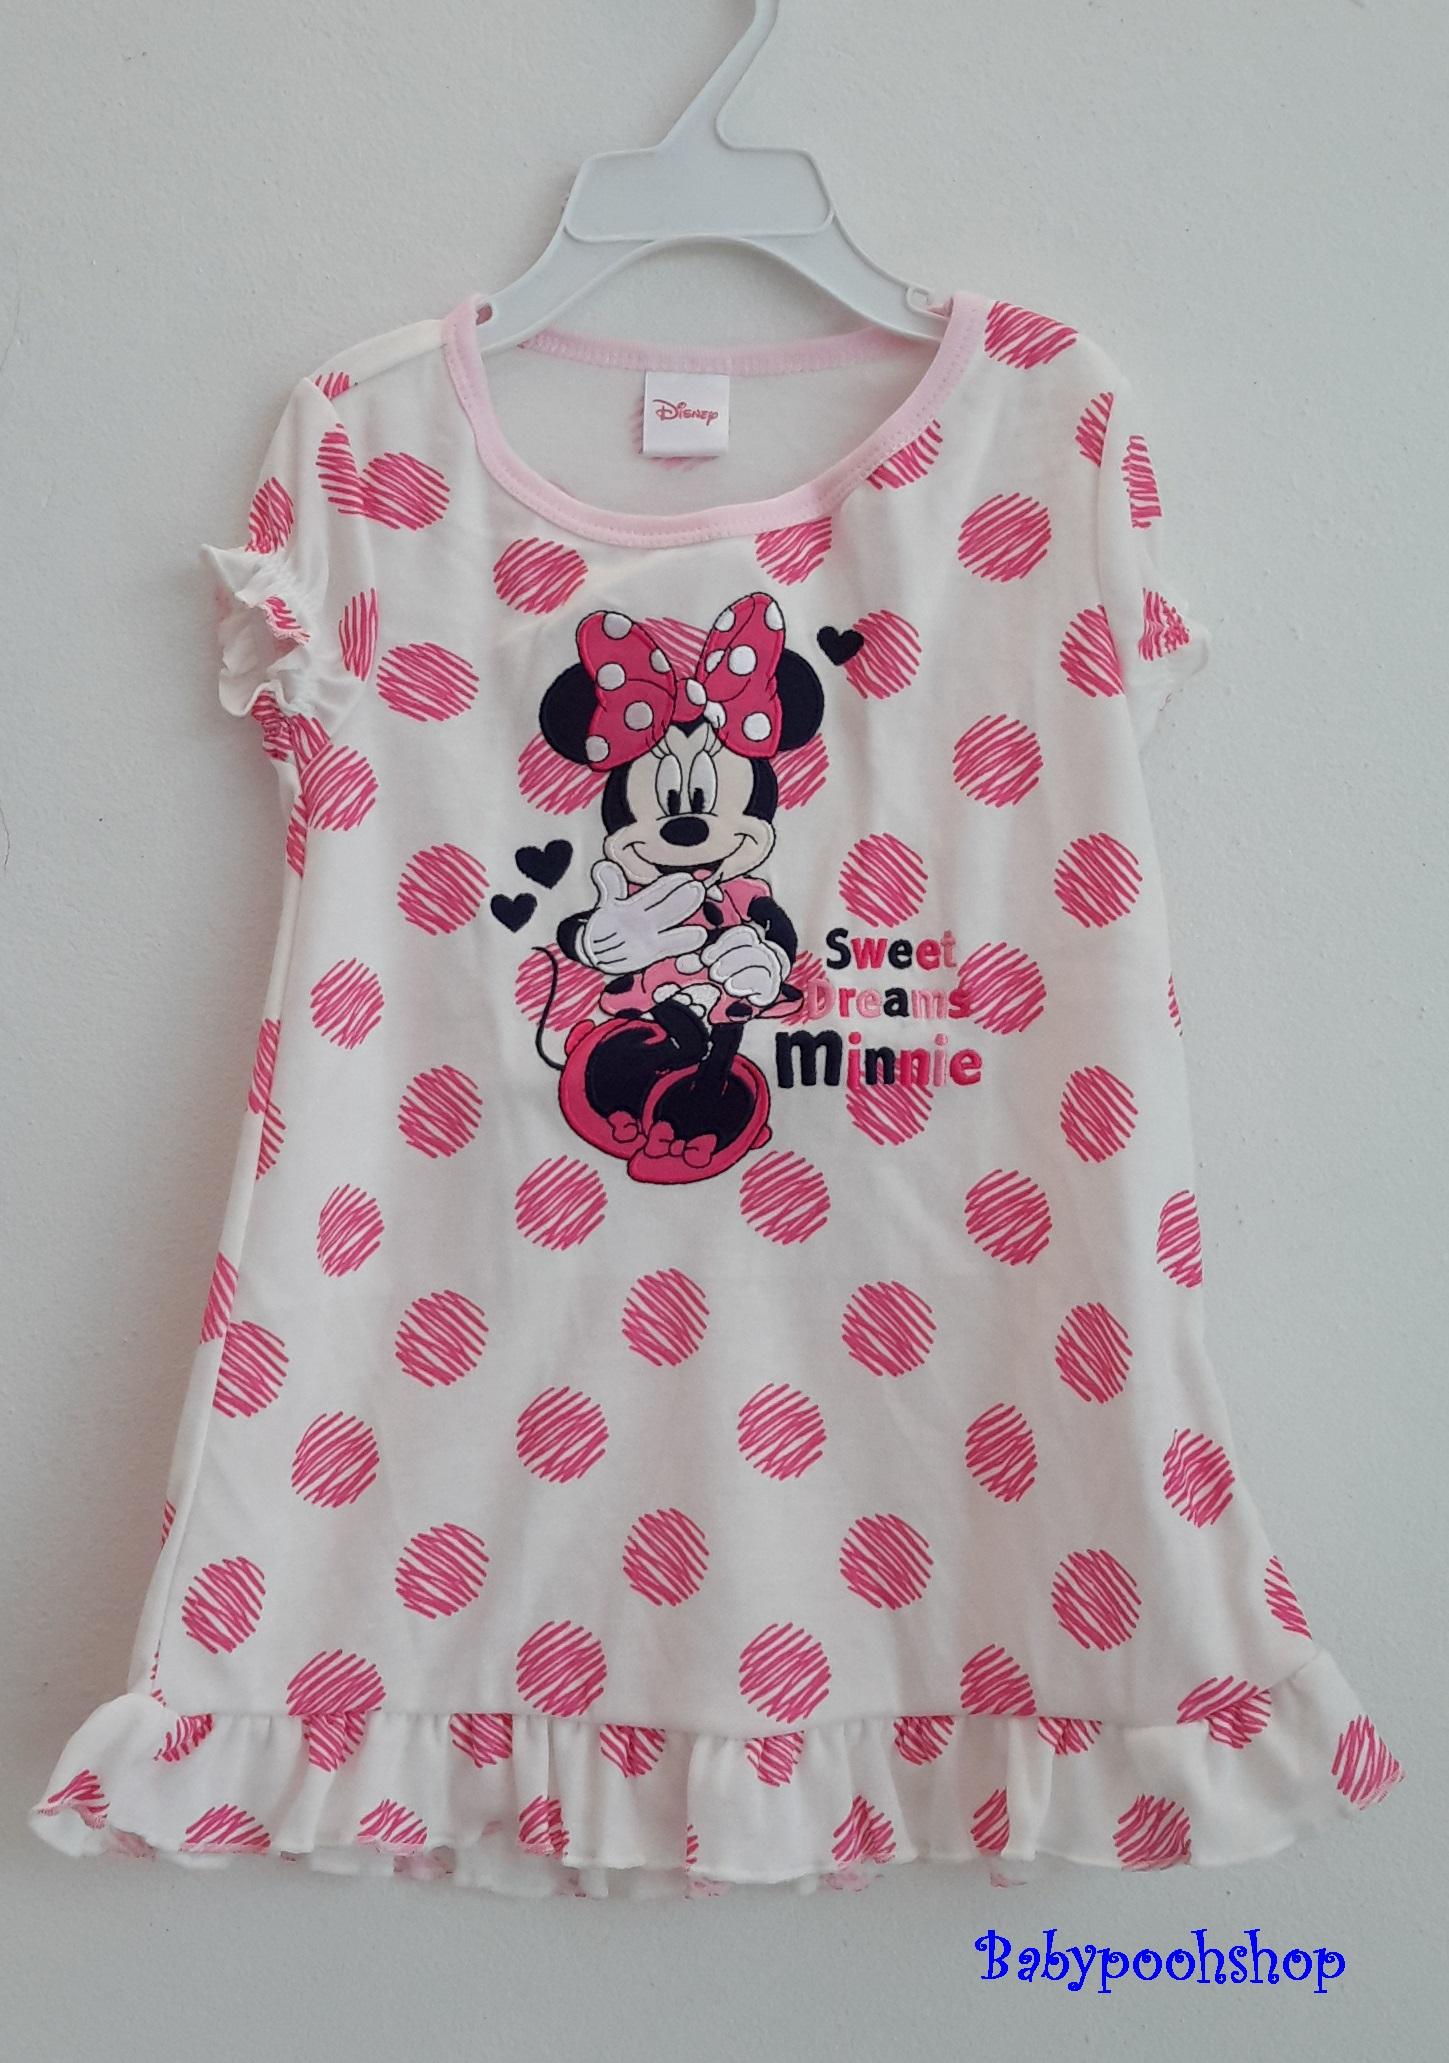 Disney : ชุดนอน ผ้า cotton ยืด สีขาว จุดลายชมพูใหญ่ ปักรูปมินนี่ Size : 12-18m / 18-23m